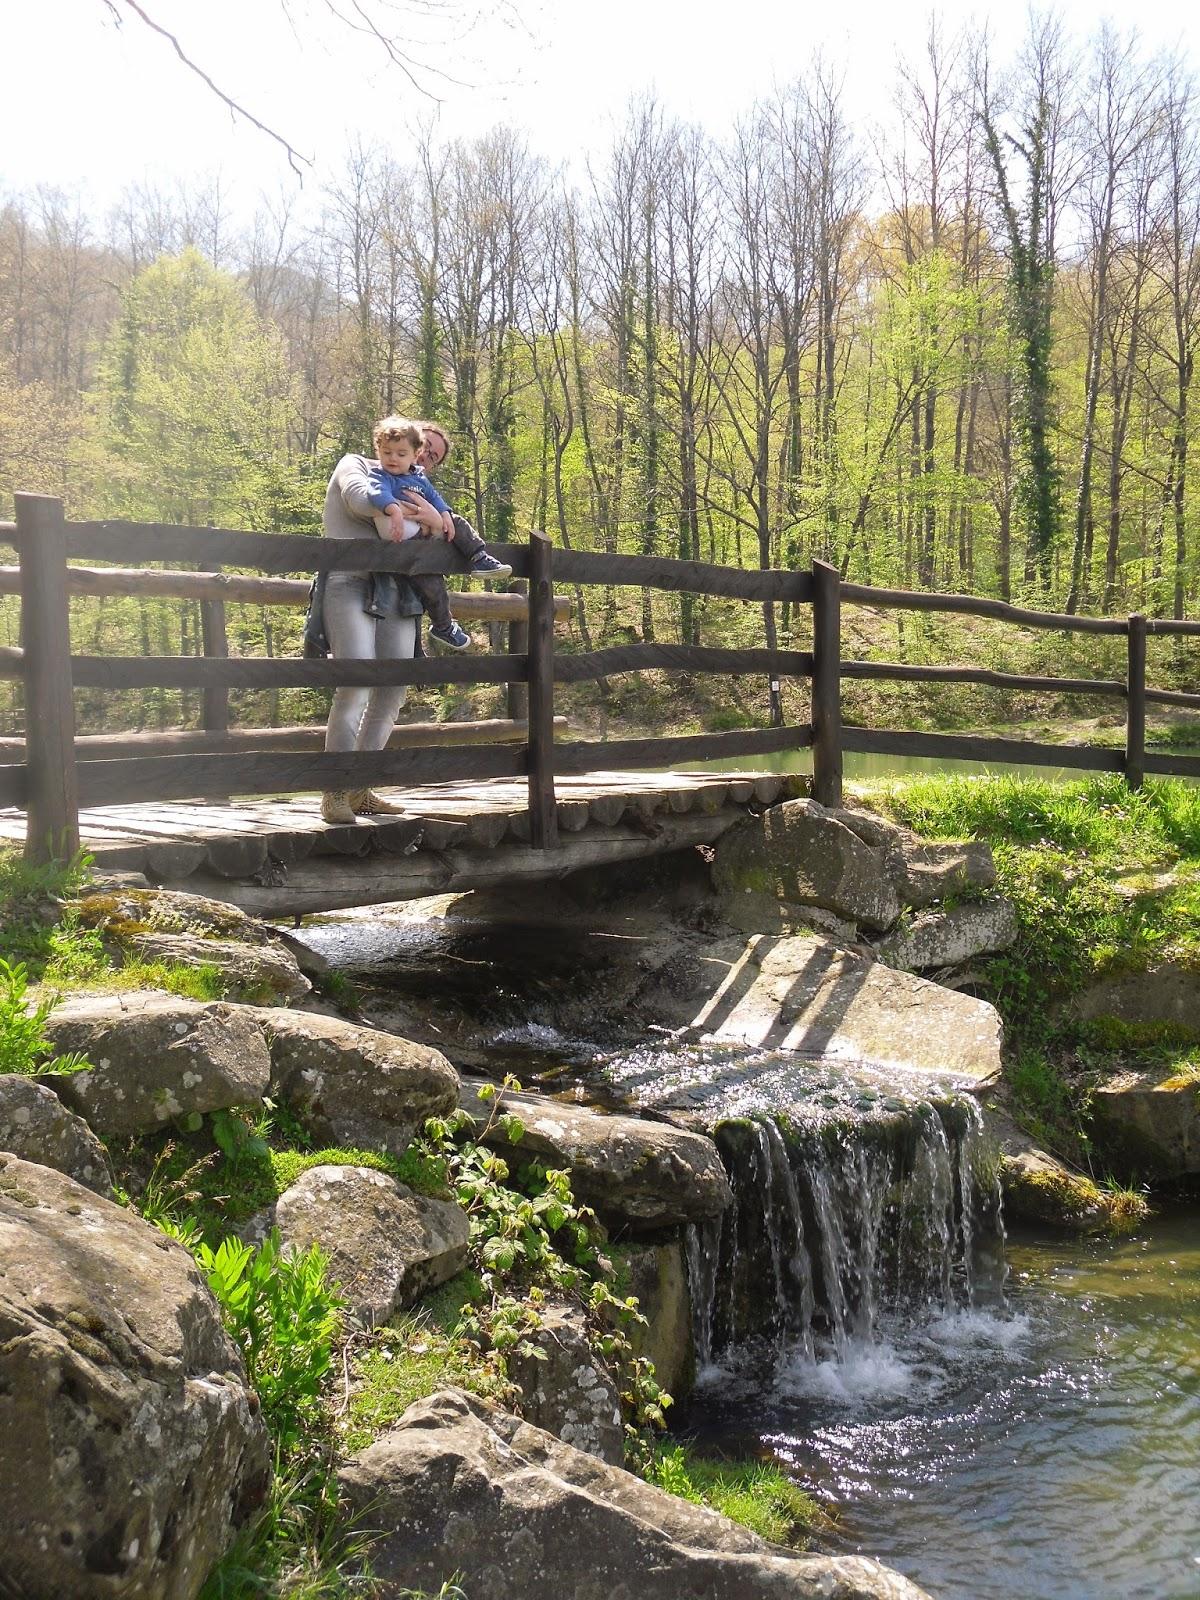 Mamma aiuta mamma relax fra le montagne romagnole al lago pontini - Lago lungo bagno di romagna ...